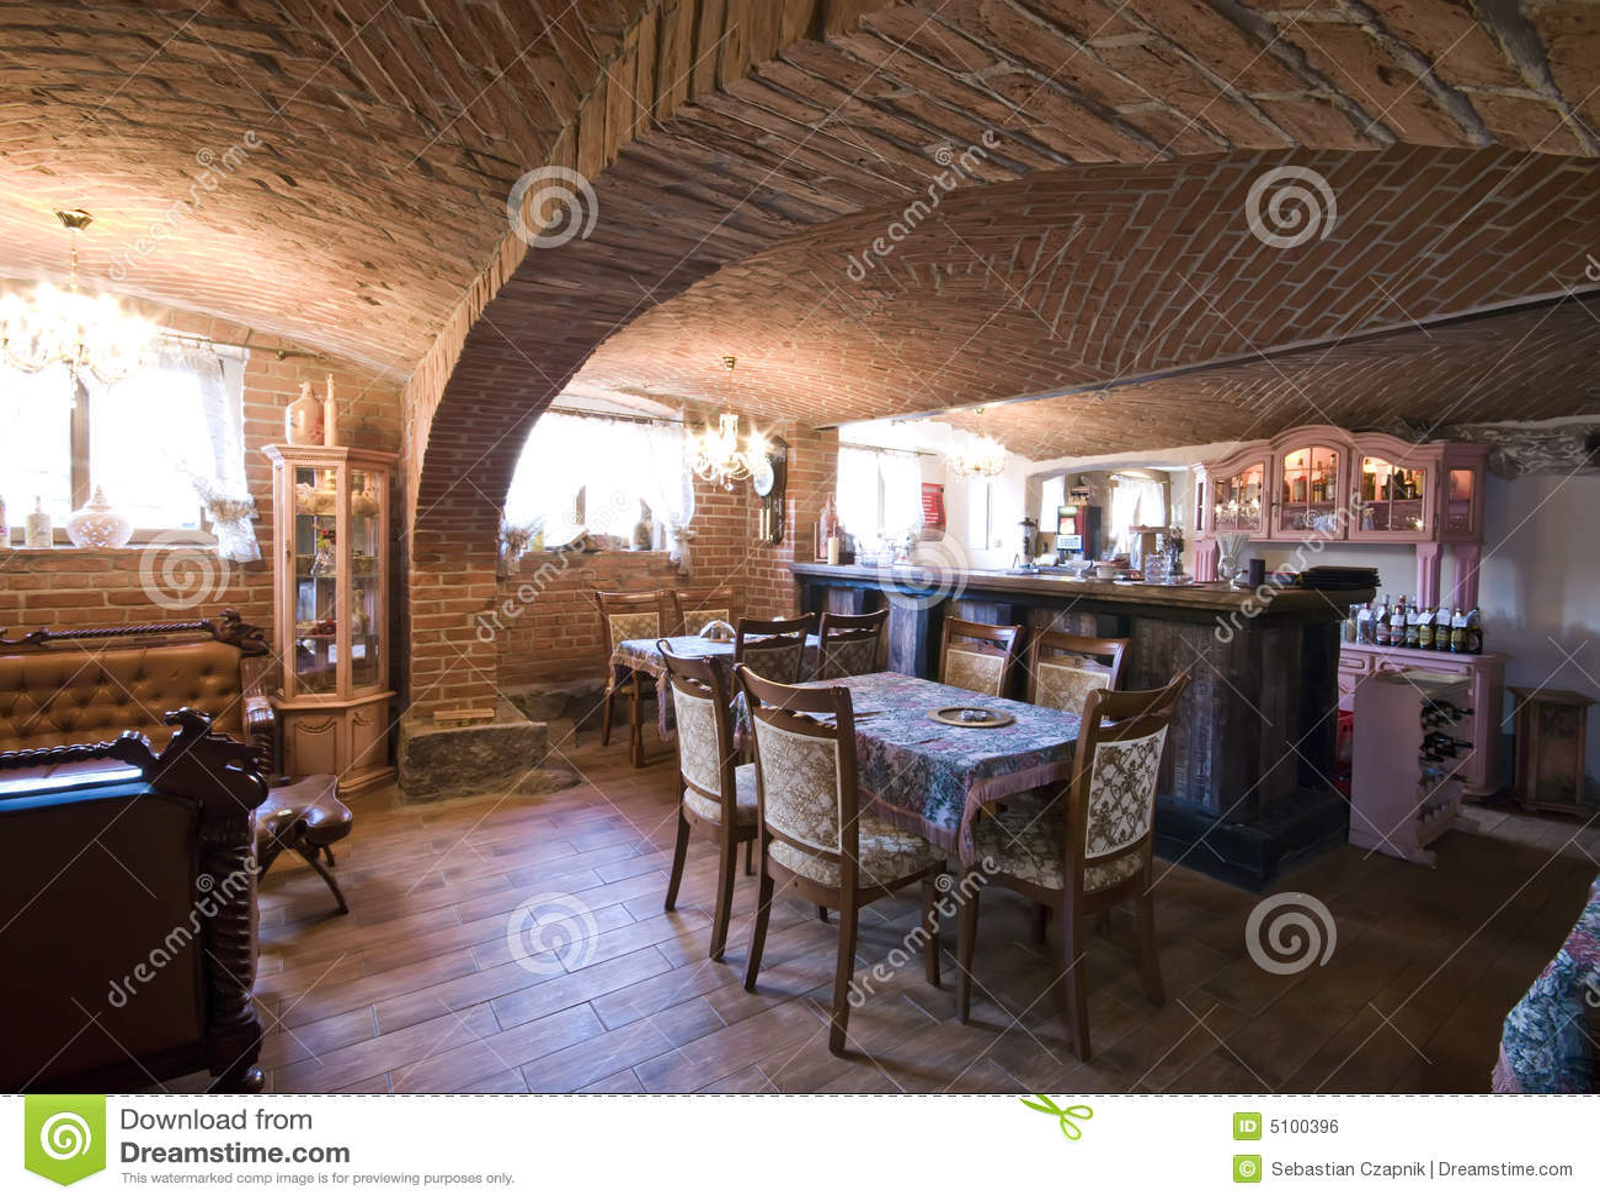 Restaurant In Brick Basement Royalty Free Stock Image  : restaurant brick basement 5100396 from dreamstime.com size 1300 x 993 jpeg 203kB